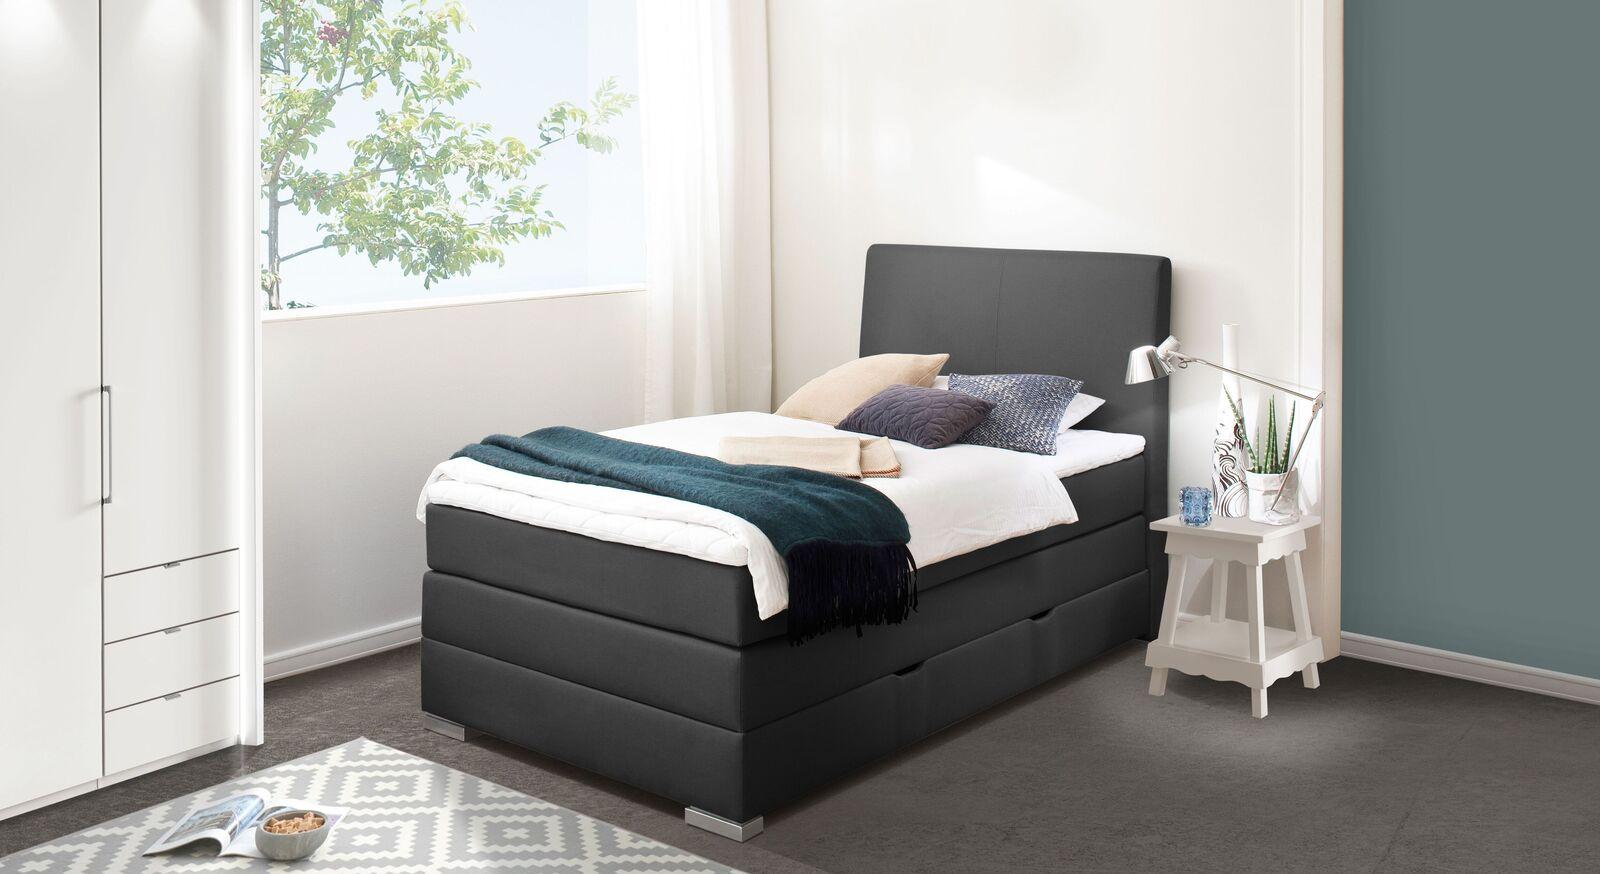 Single-Schlafzimmer modern mit Bettkasten-Boxspringbett - Ivetta